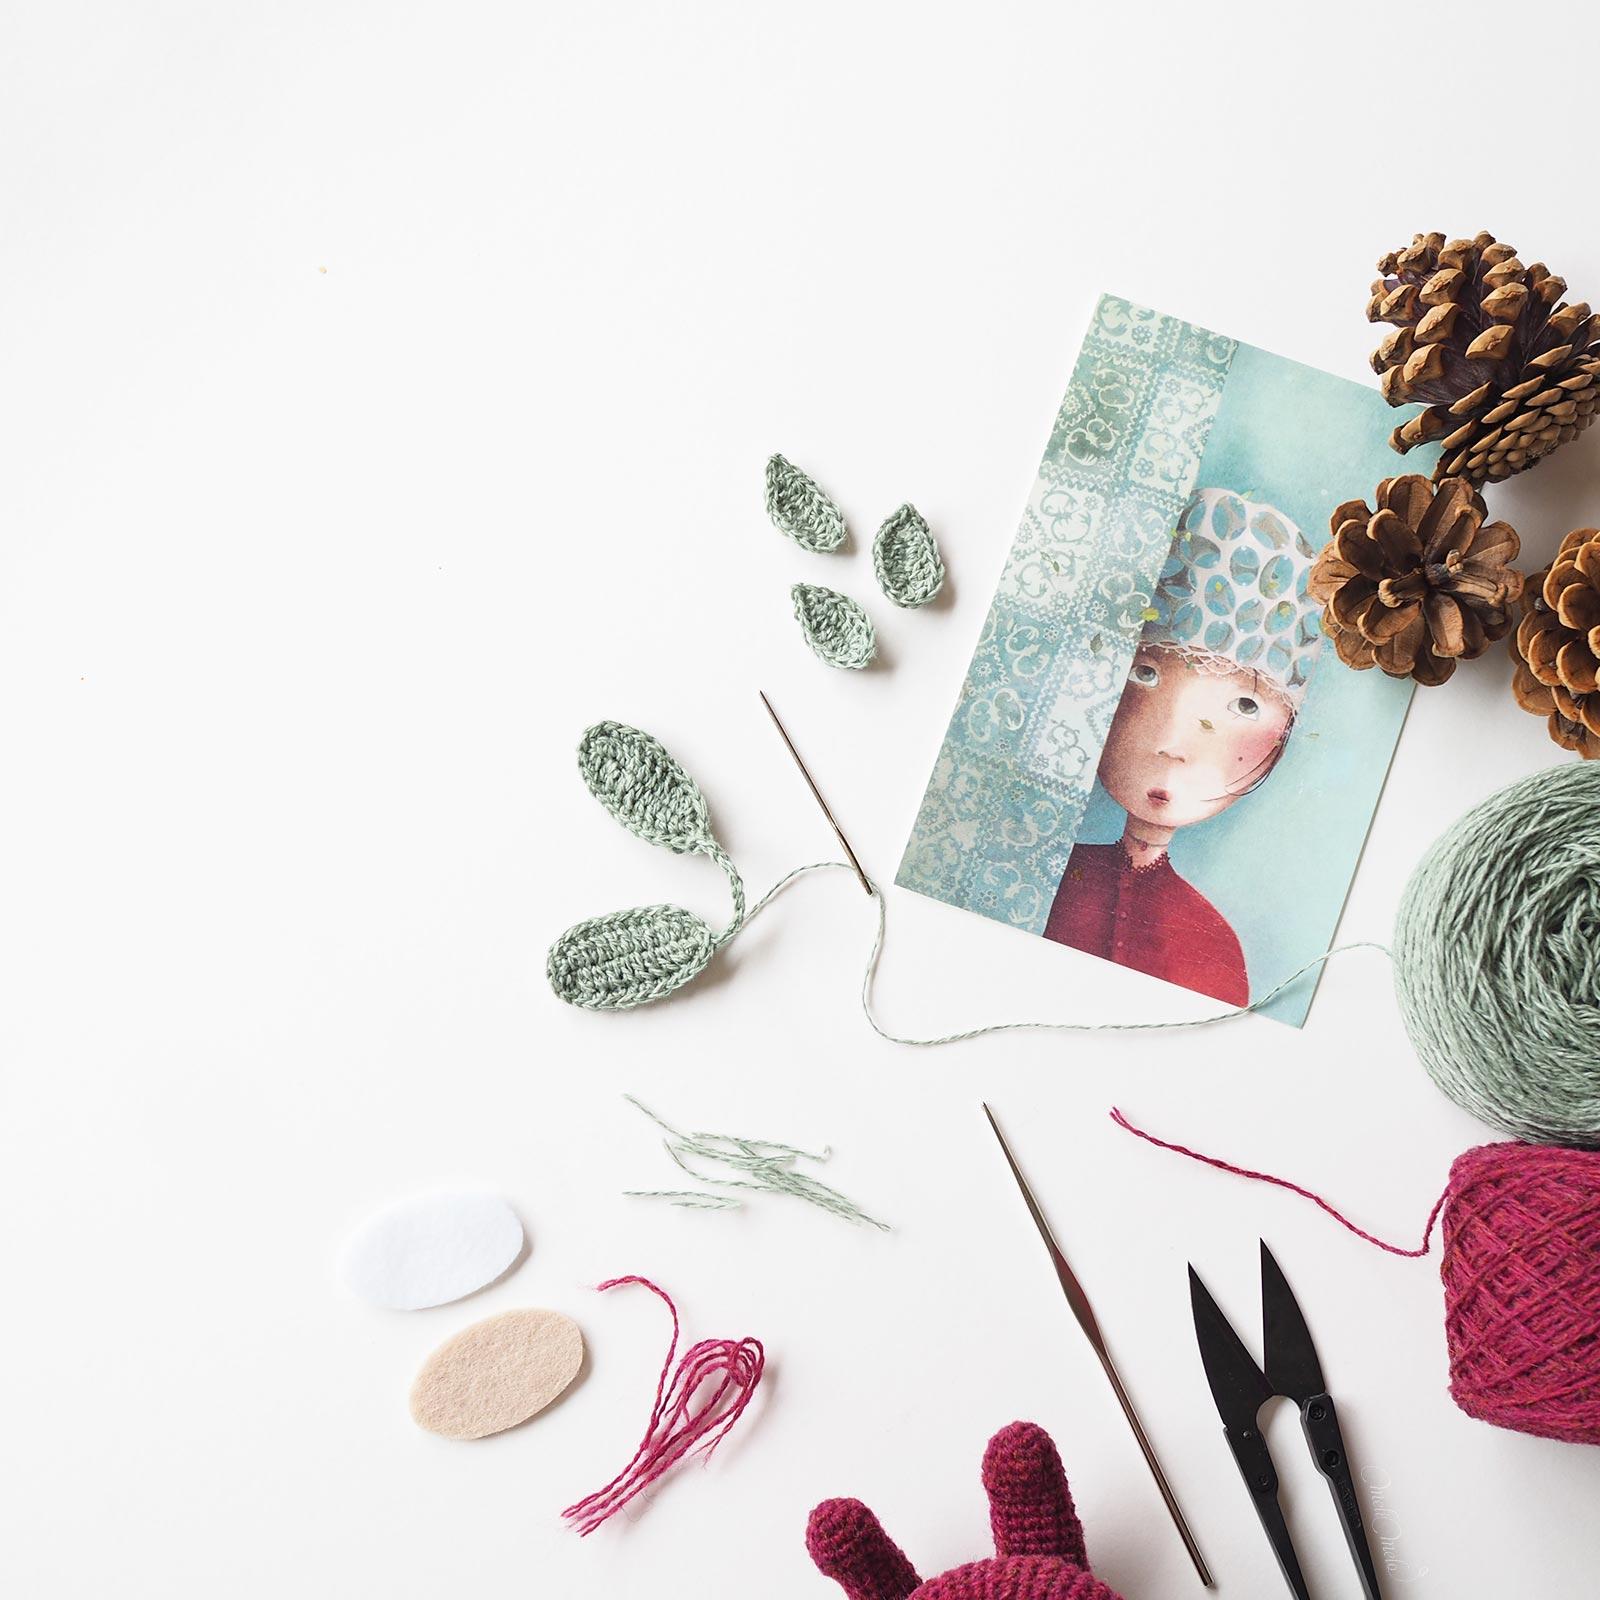 elfe pins inspiration poème Cicely Mary Barker illustration Rébecca Dautremer créations mignonneries crochet laboutiquedemelimelo